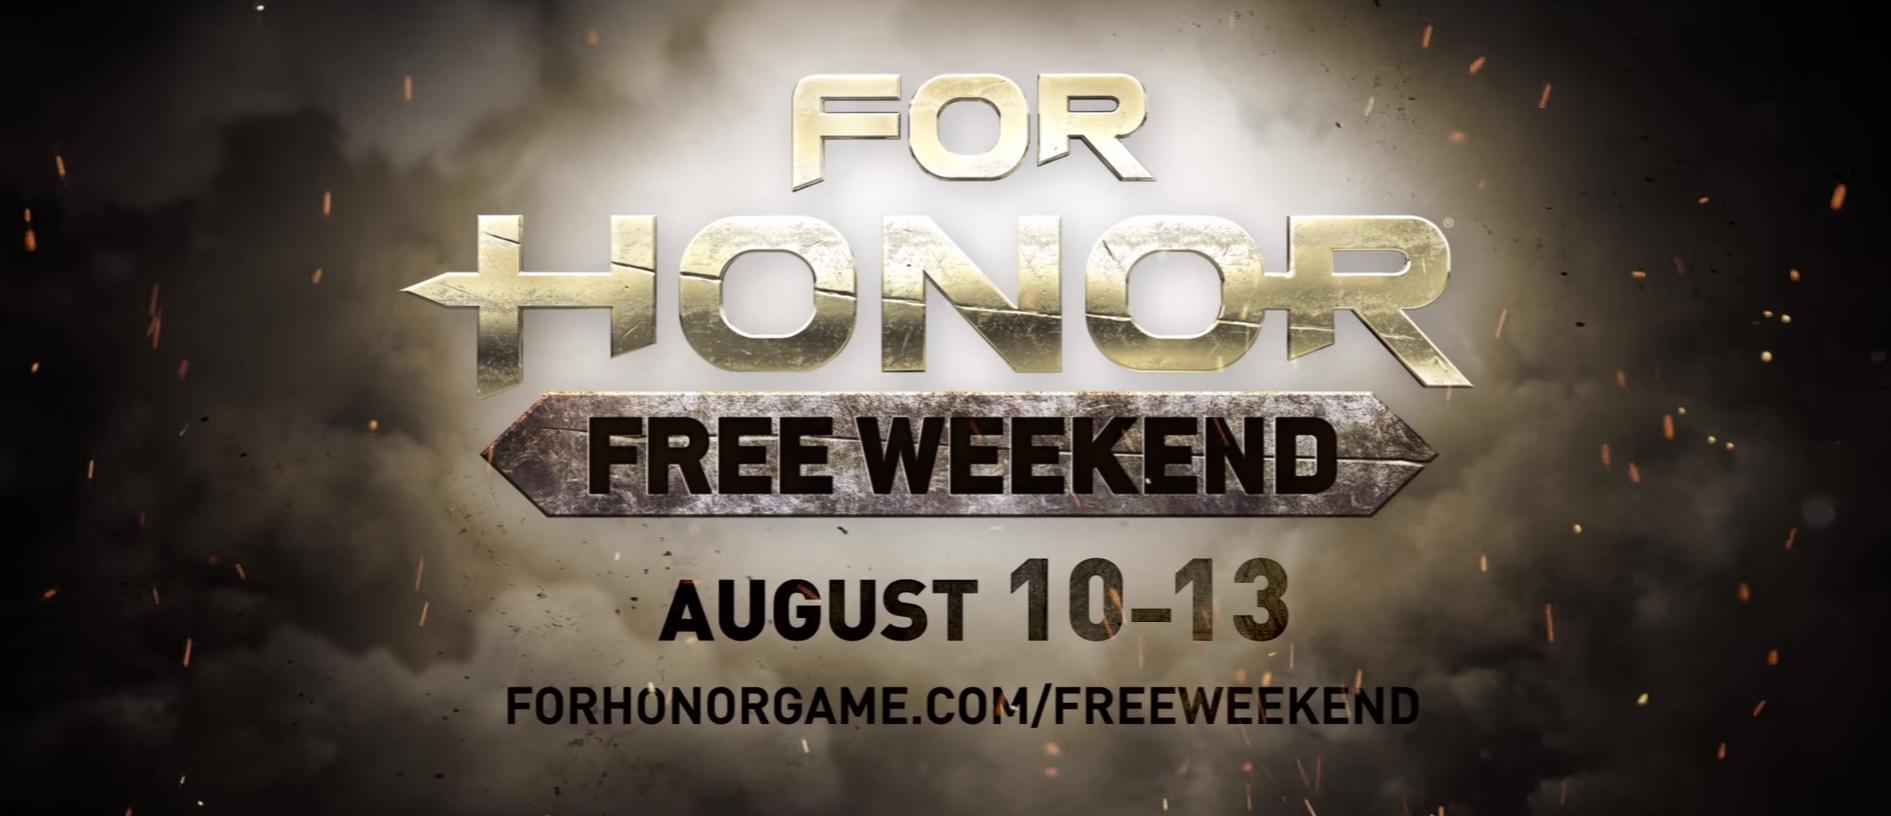 Photo of For Honor poate fi jucat gratuit în acest weekend